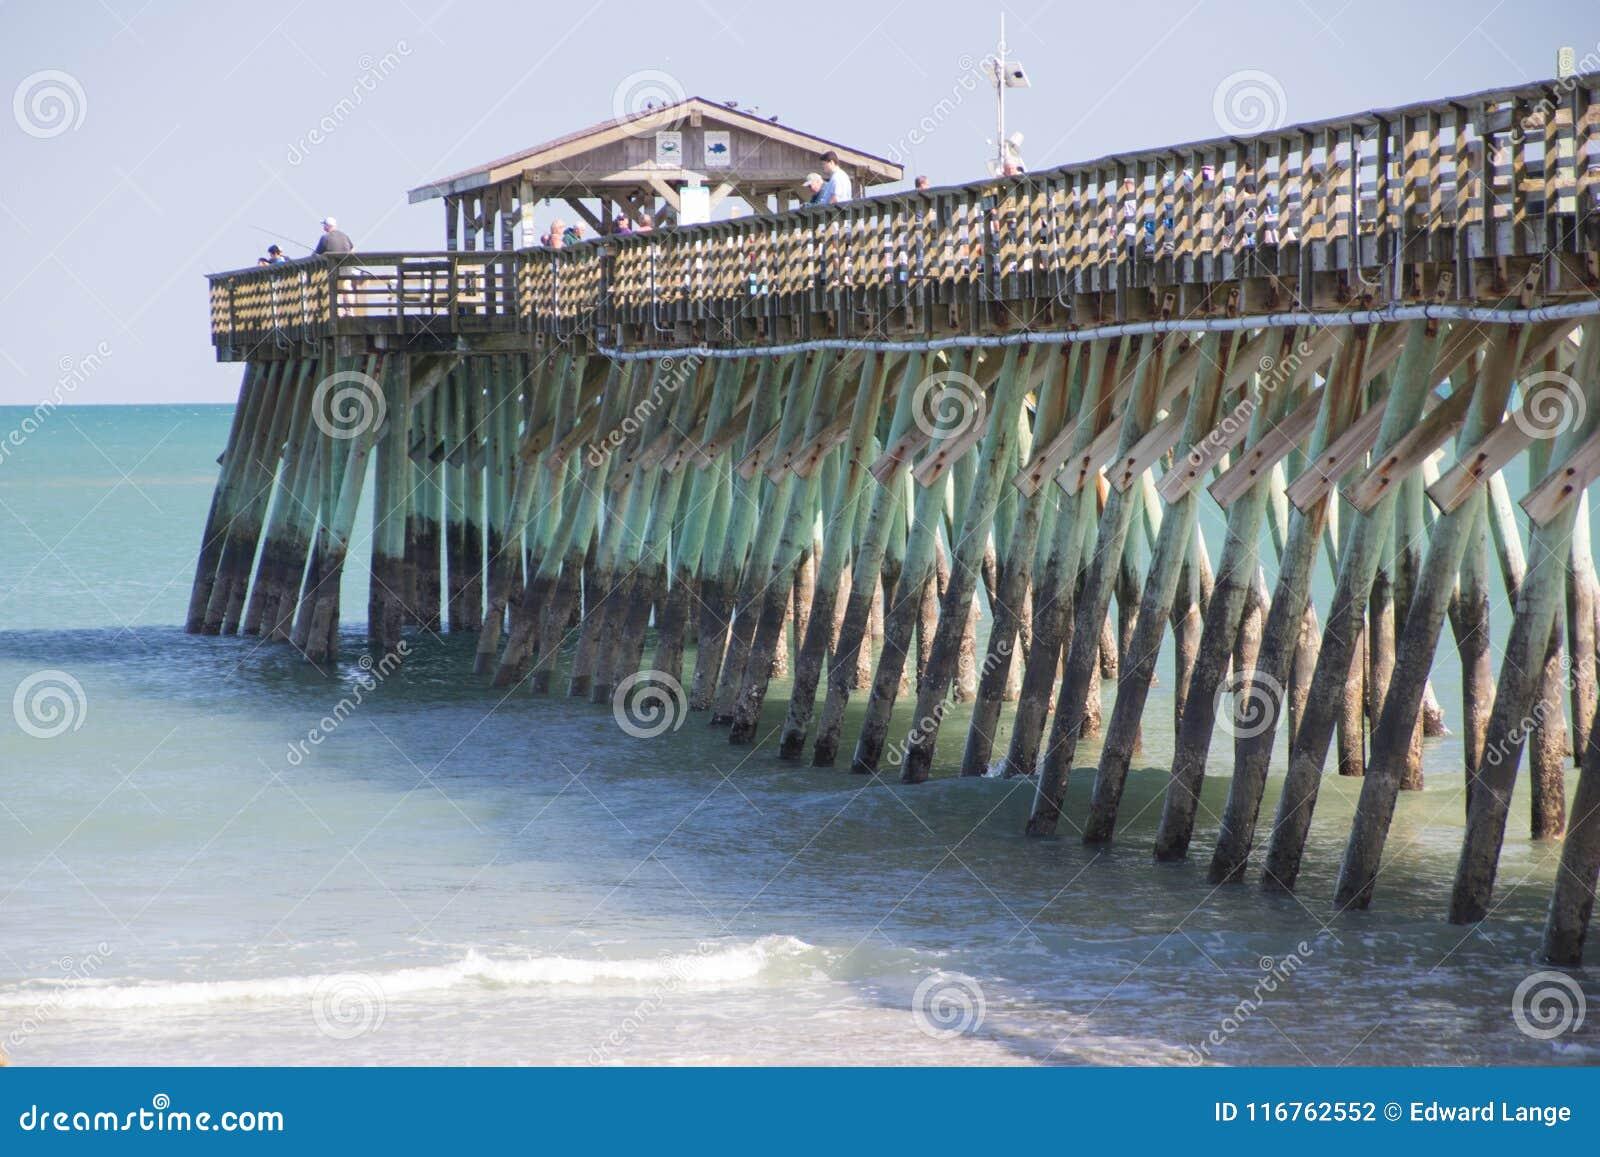 Myrtle Beach, αποβάθρα αλιείας κρατικών πάρκων της νότιας Καρολίνας